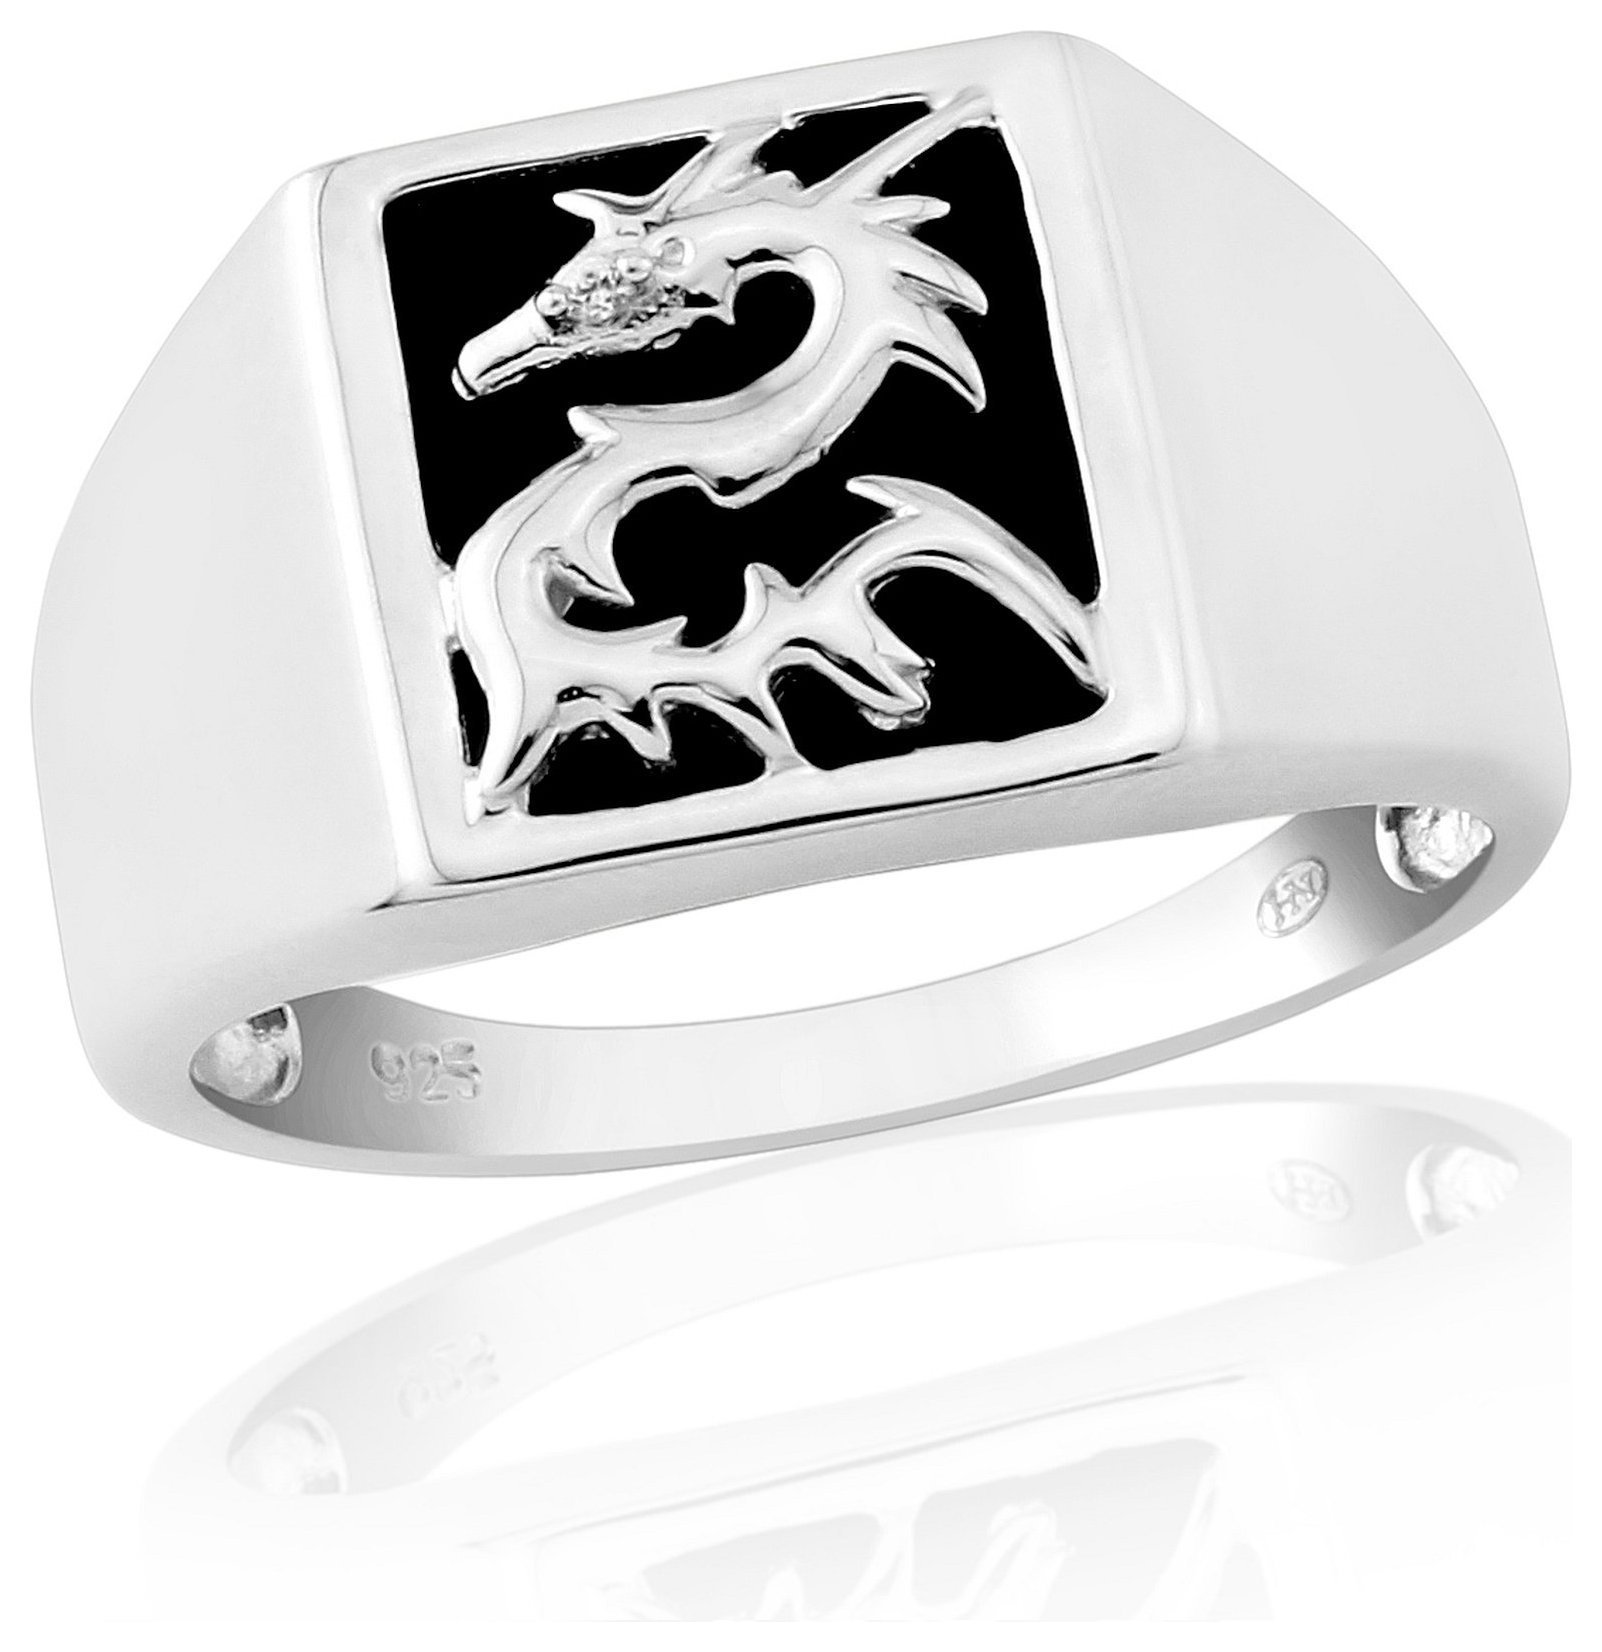 Buy Sterling Silver Black yx CZ Dragon Signet Ring R at Argos